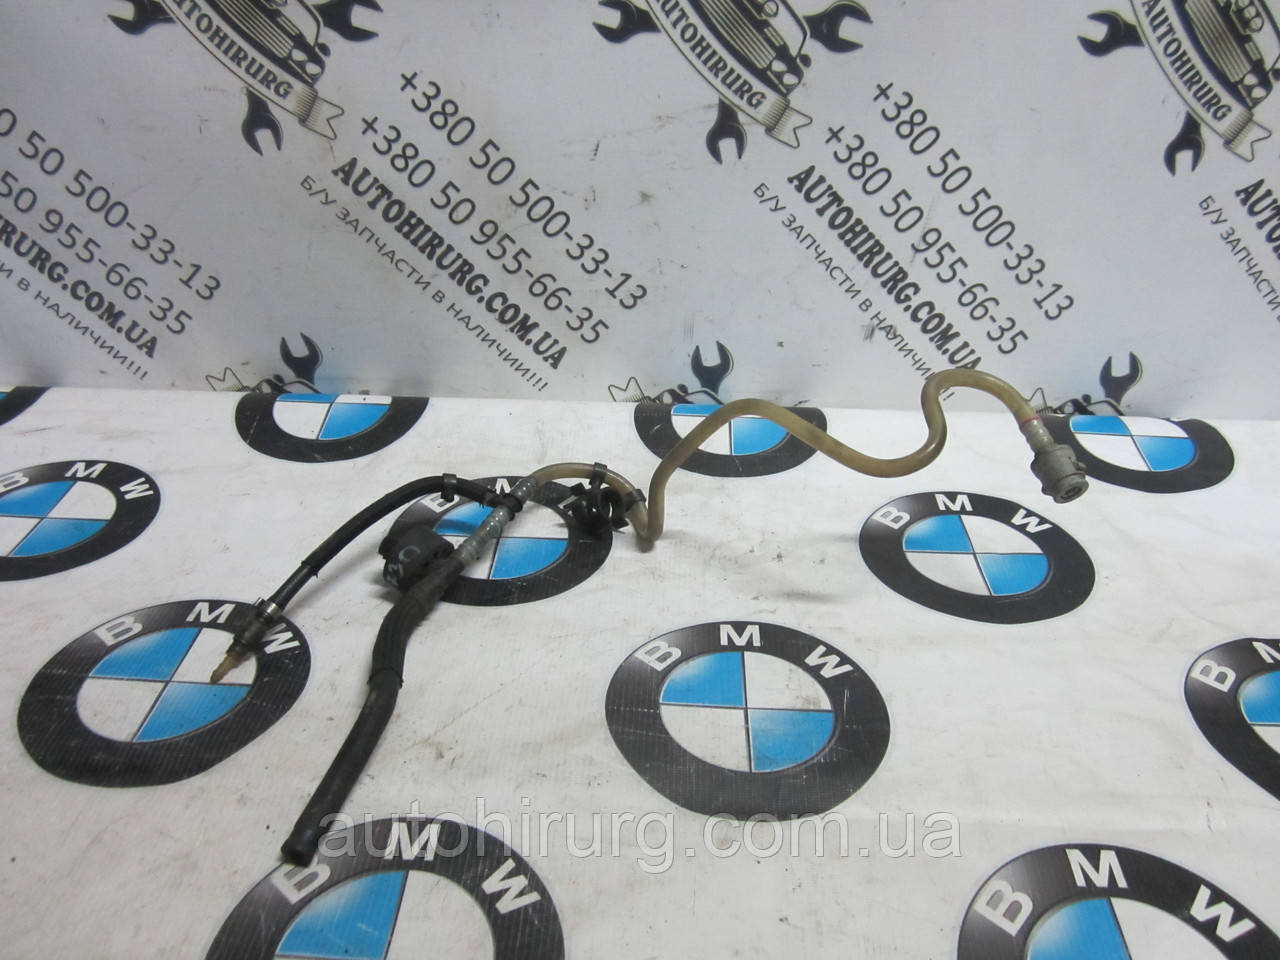 Трубка подачи топлива на топливную аппаратуру BMW e65/e66 730d, фото 1